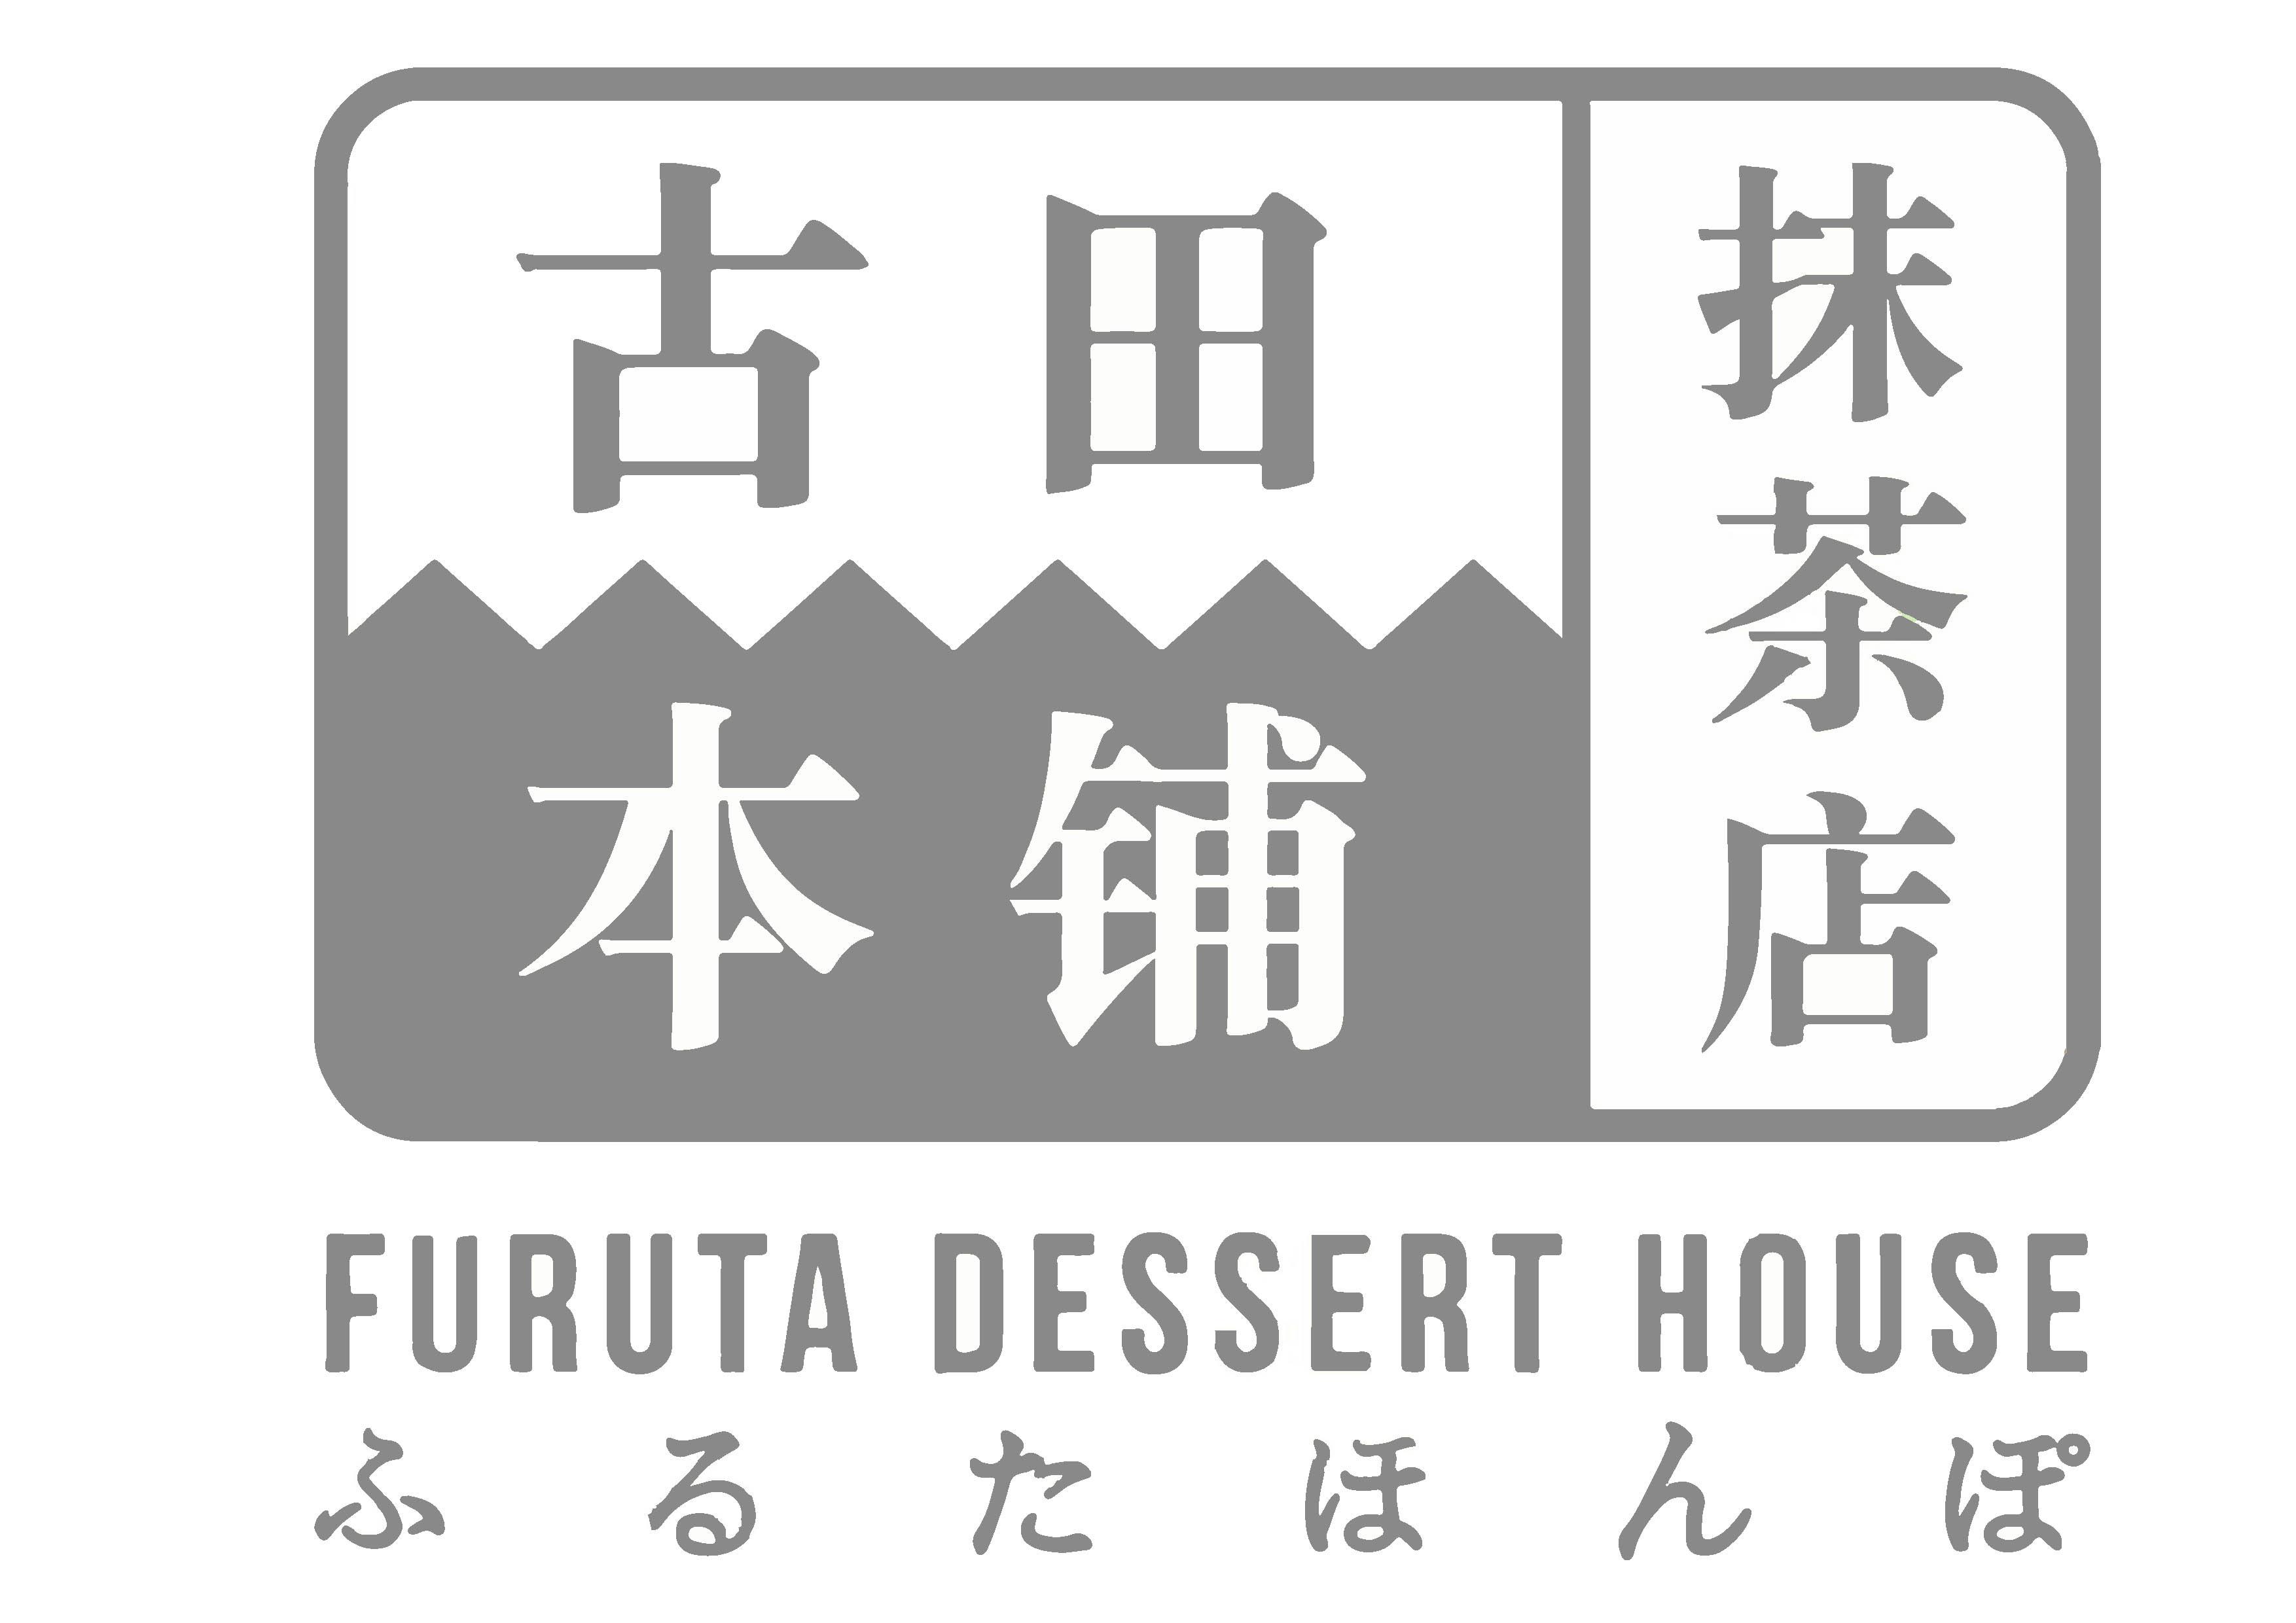 Furuta Matcha House